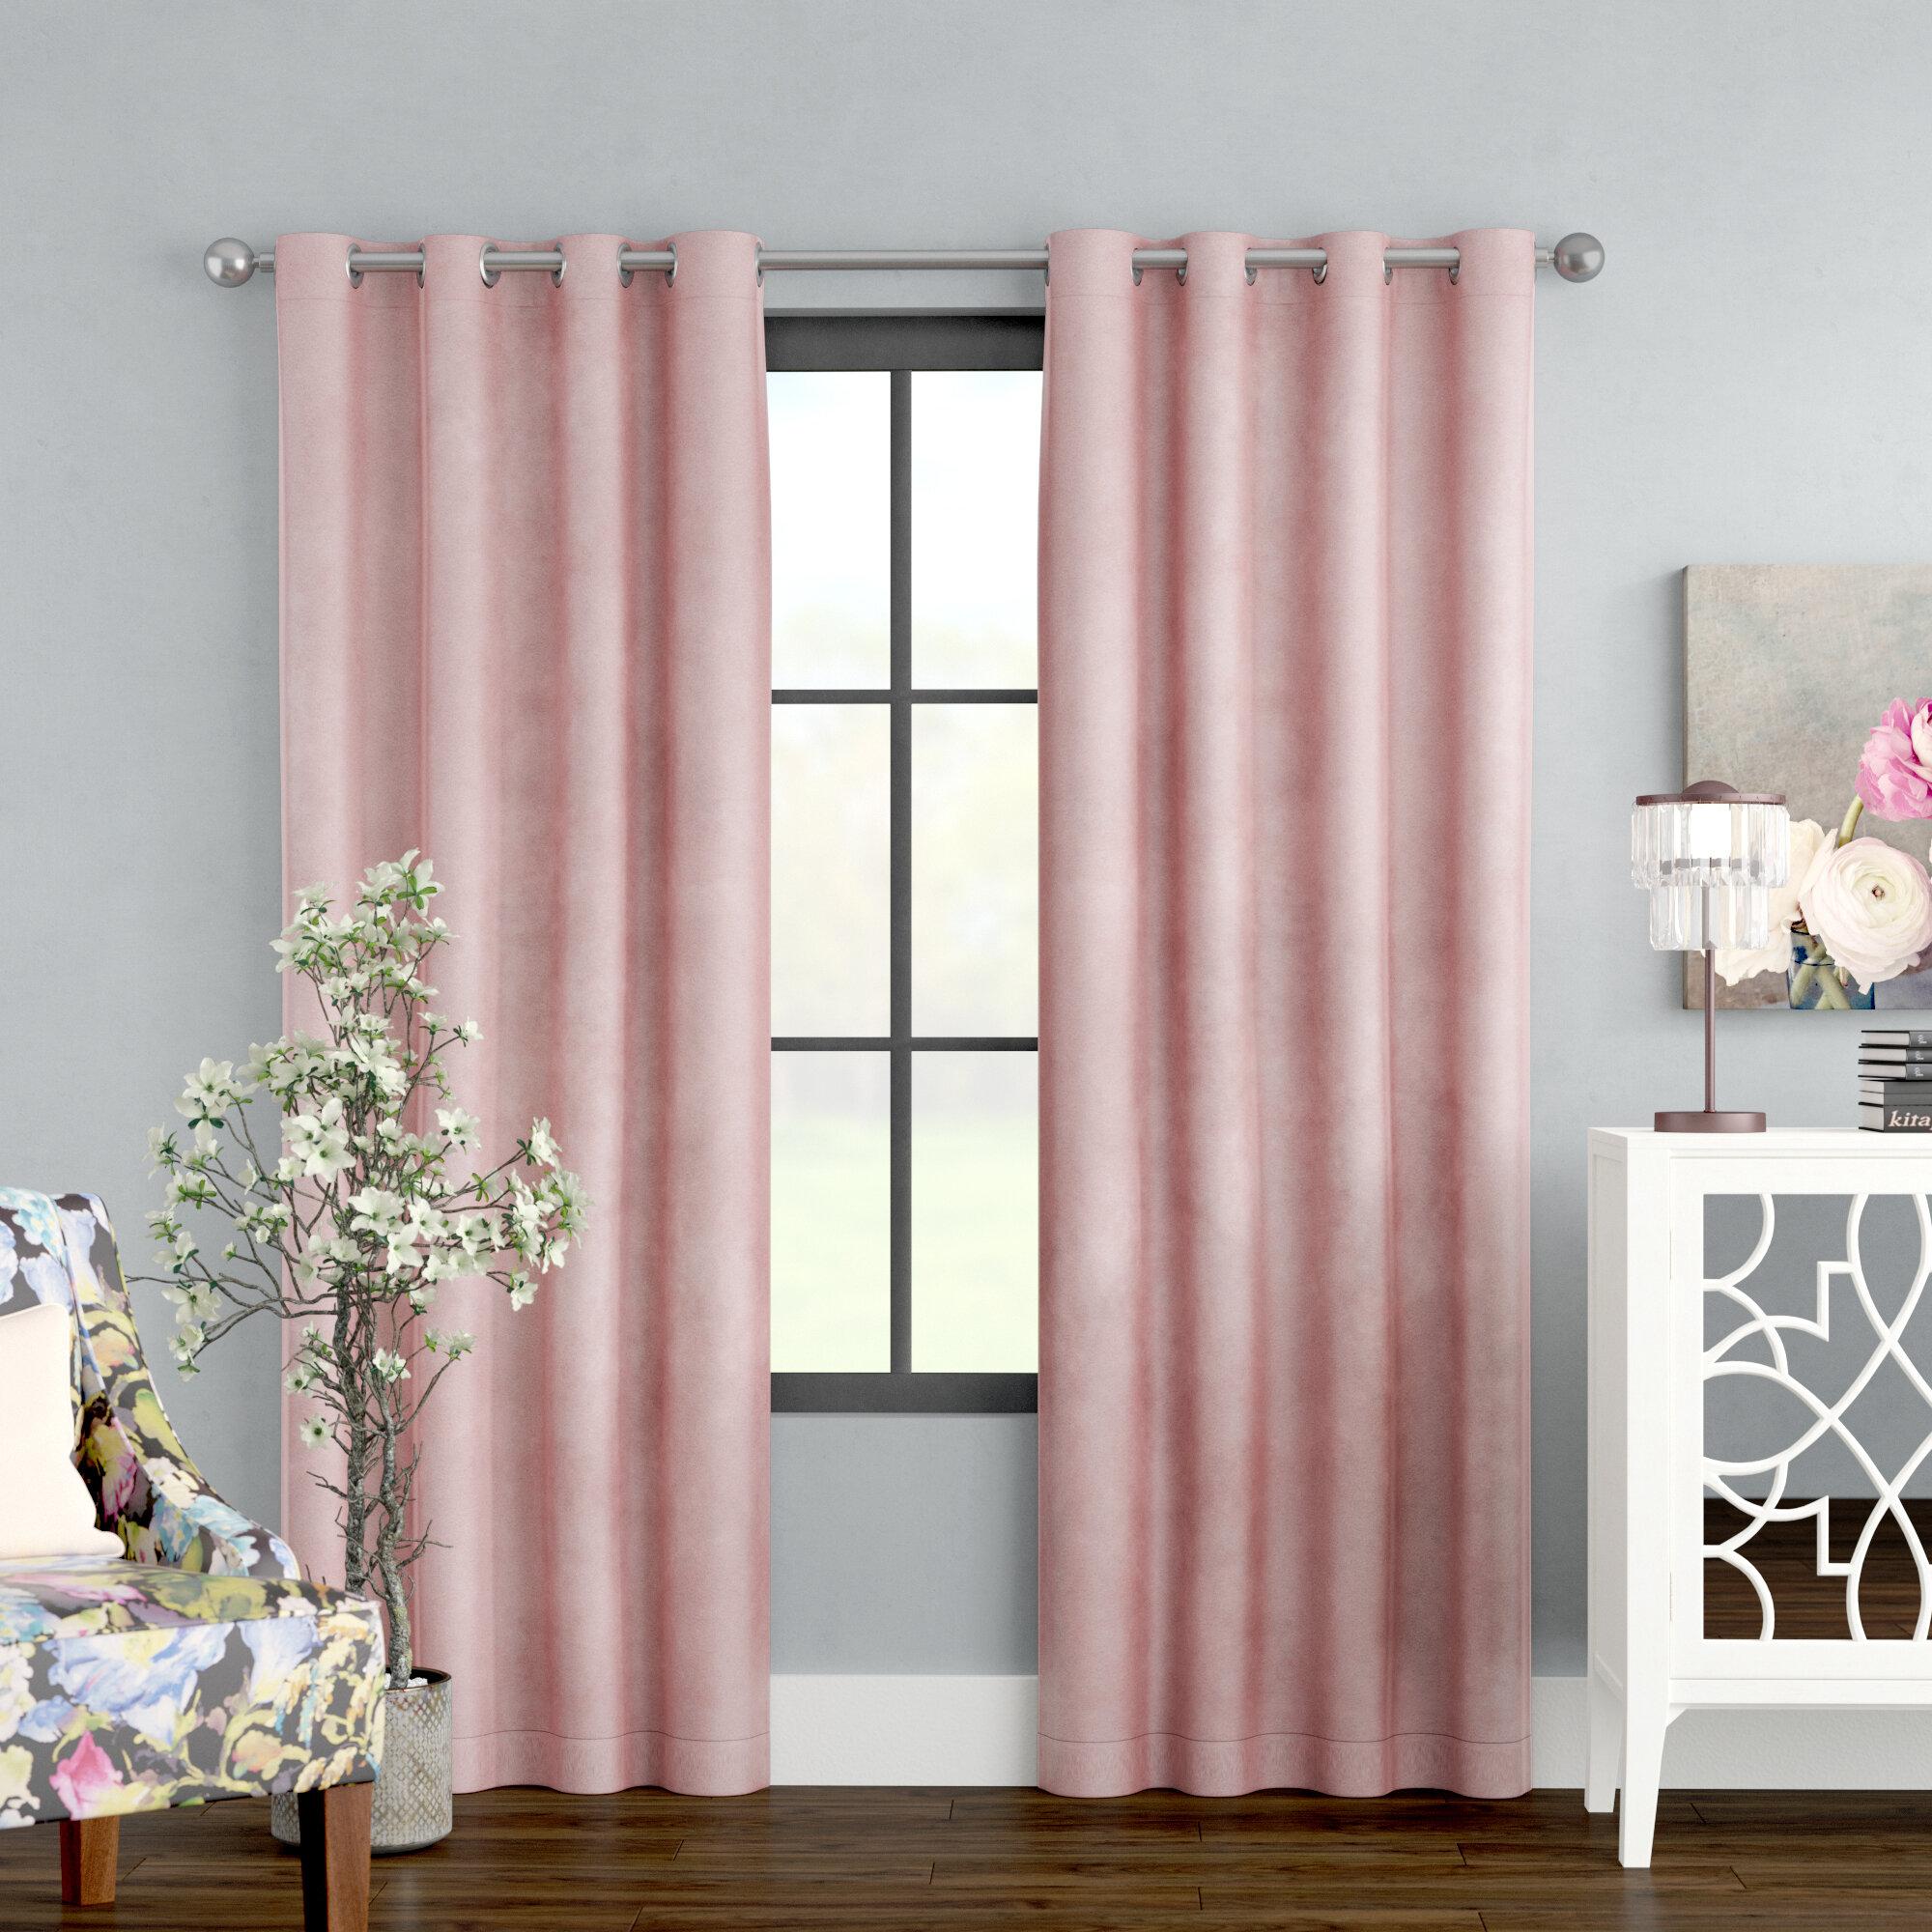 Pink Velvet Curtains Drapes You Ll Love In 2021 Wayfair